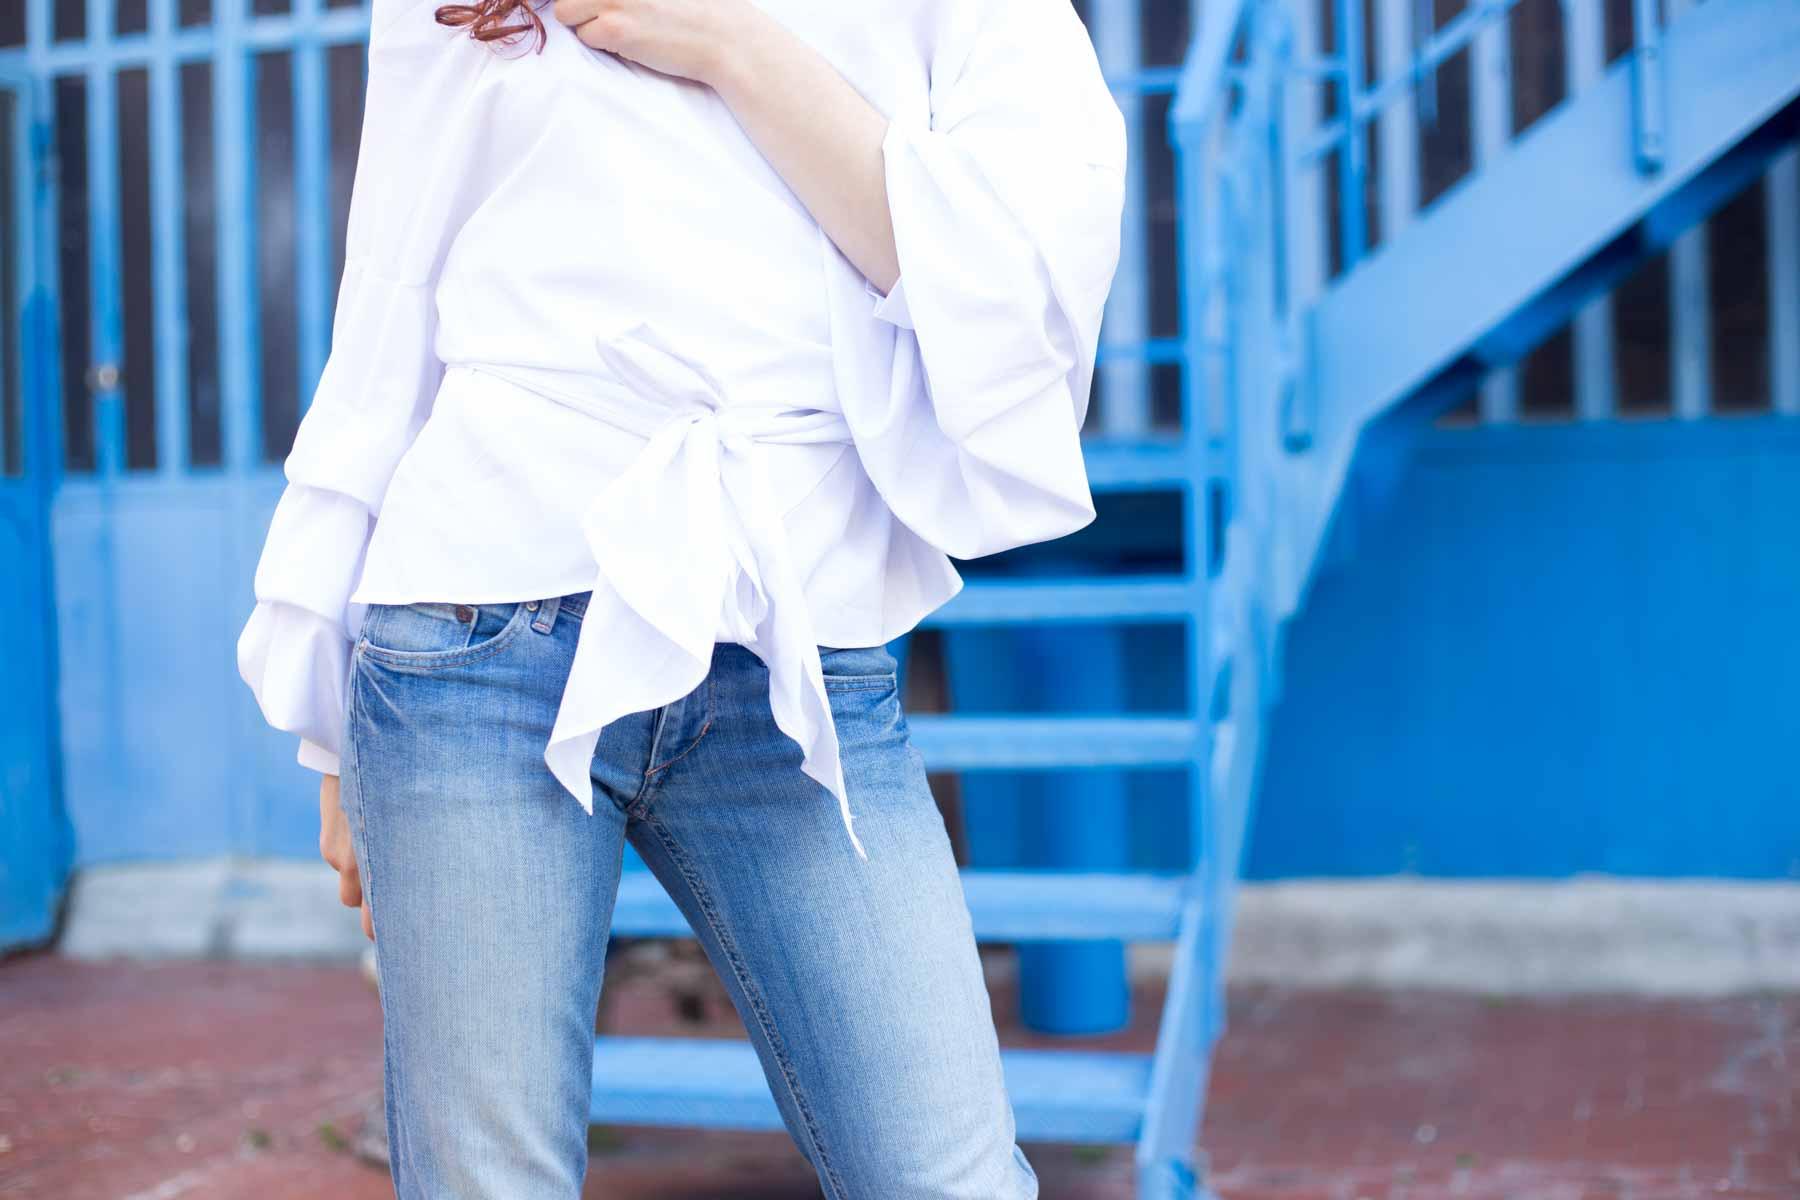 camicia bianca incrociata